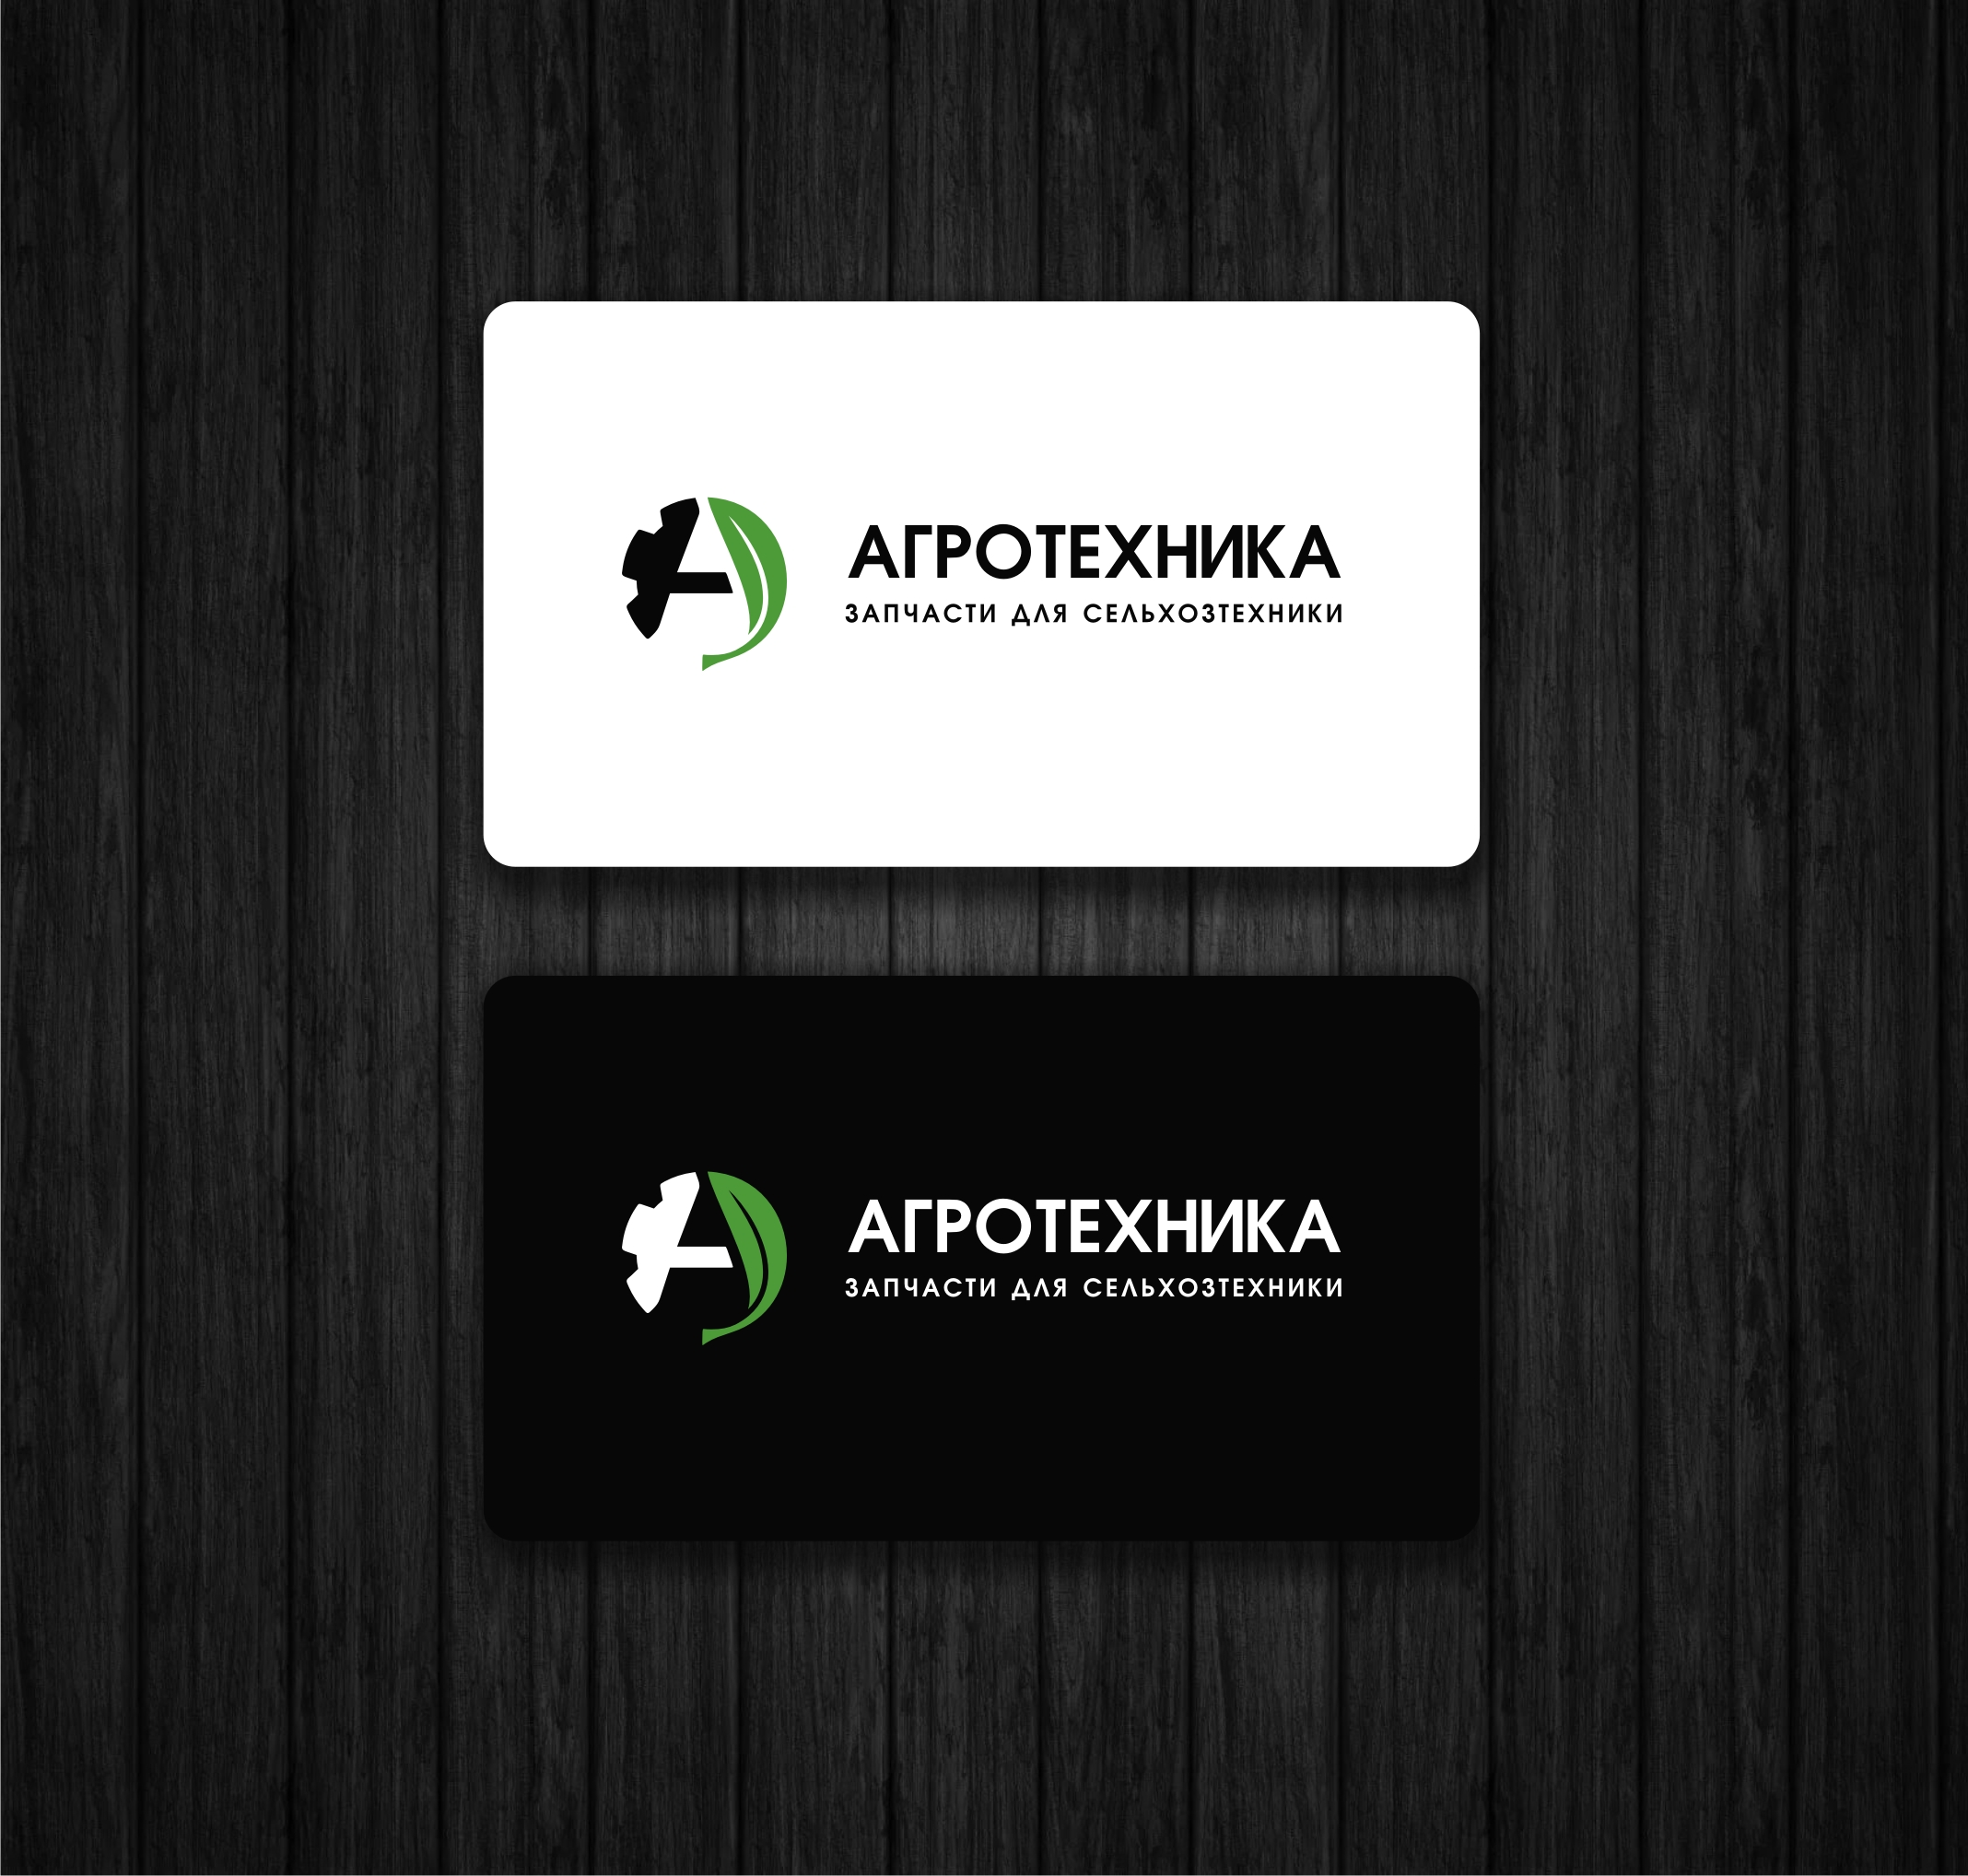 Разработка логотипа для компании Агротехника фото f_2655c0266326a475.jpg